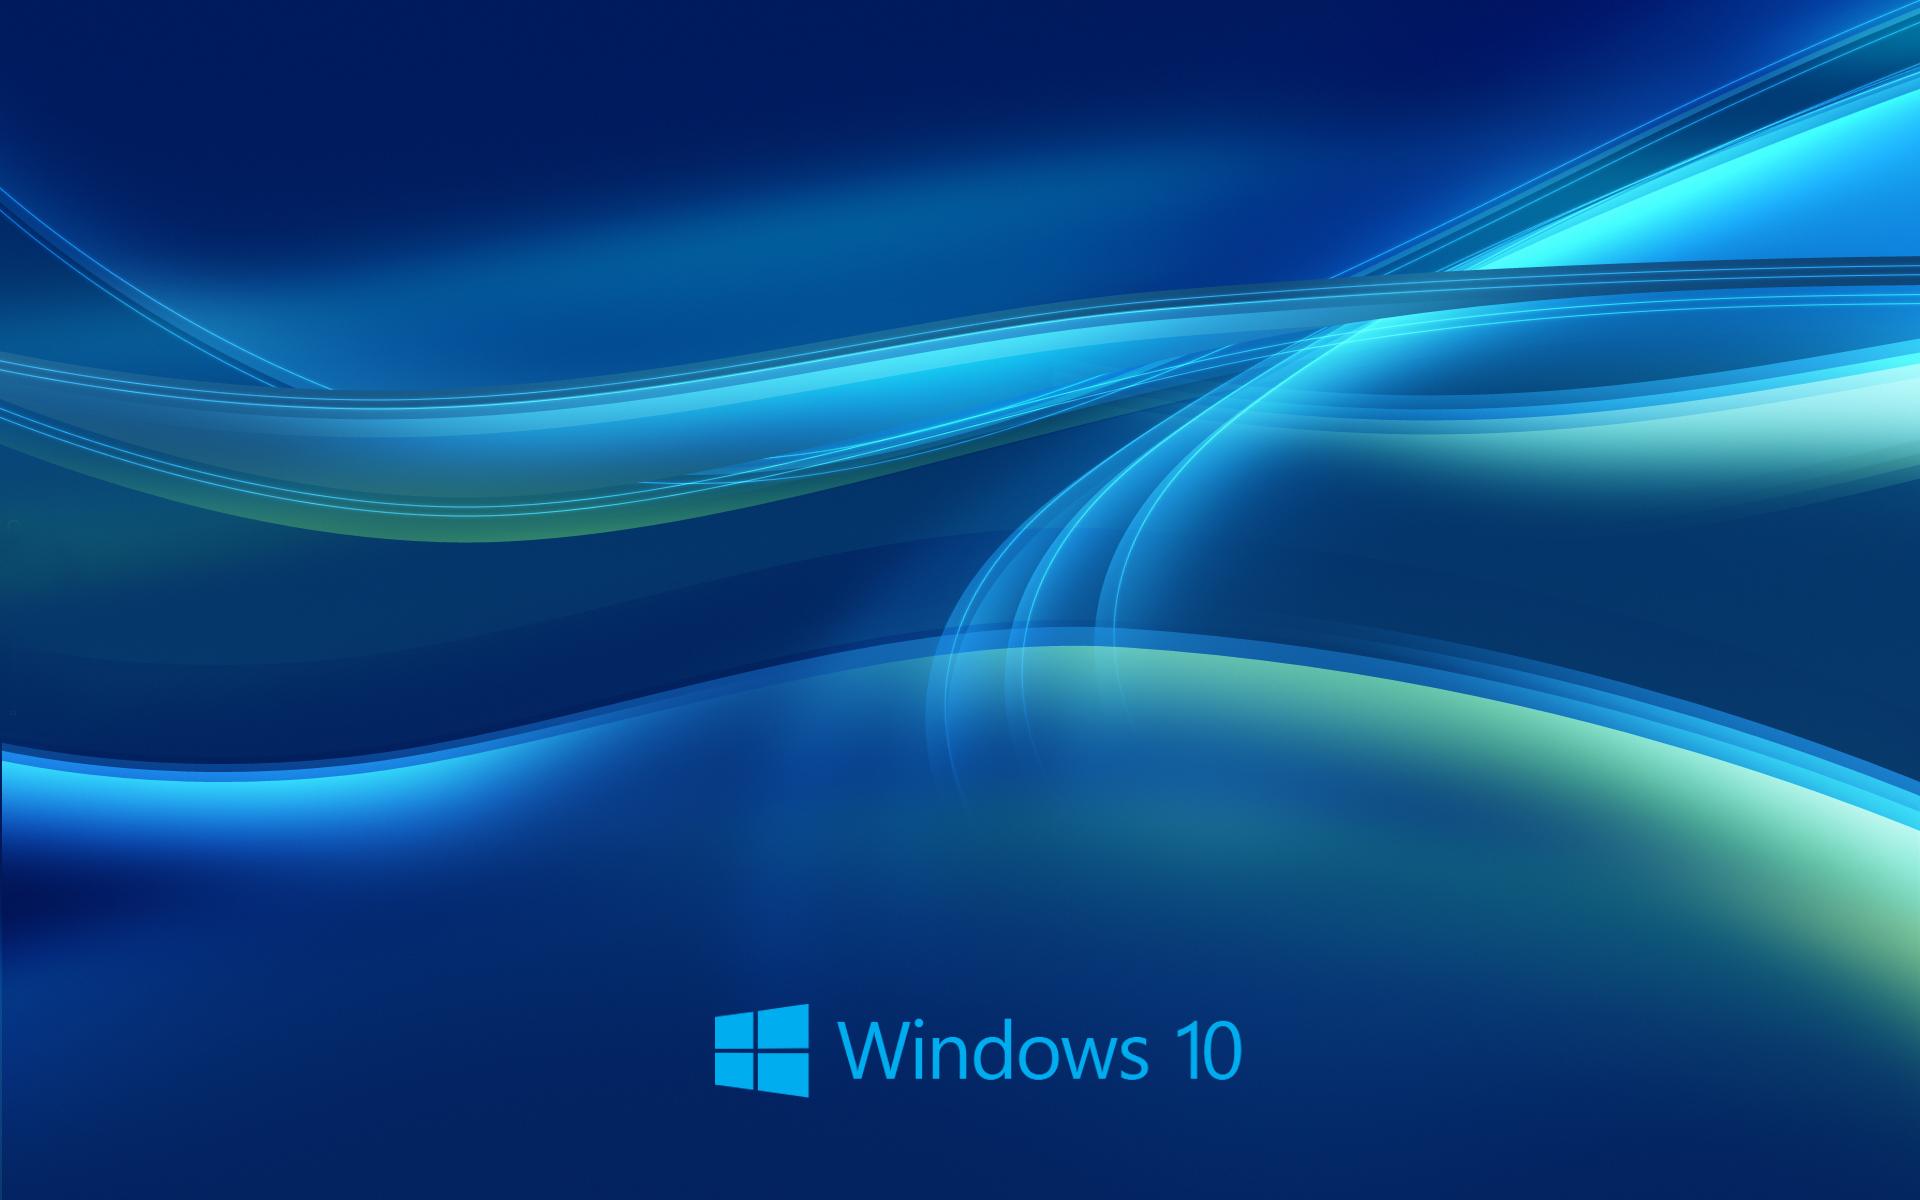 Windows 10 Wallpapers 1920x1200